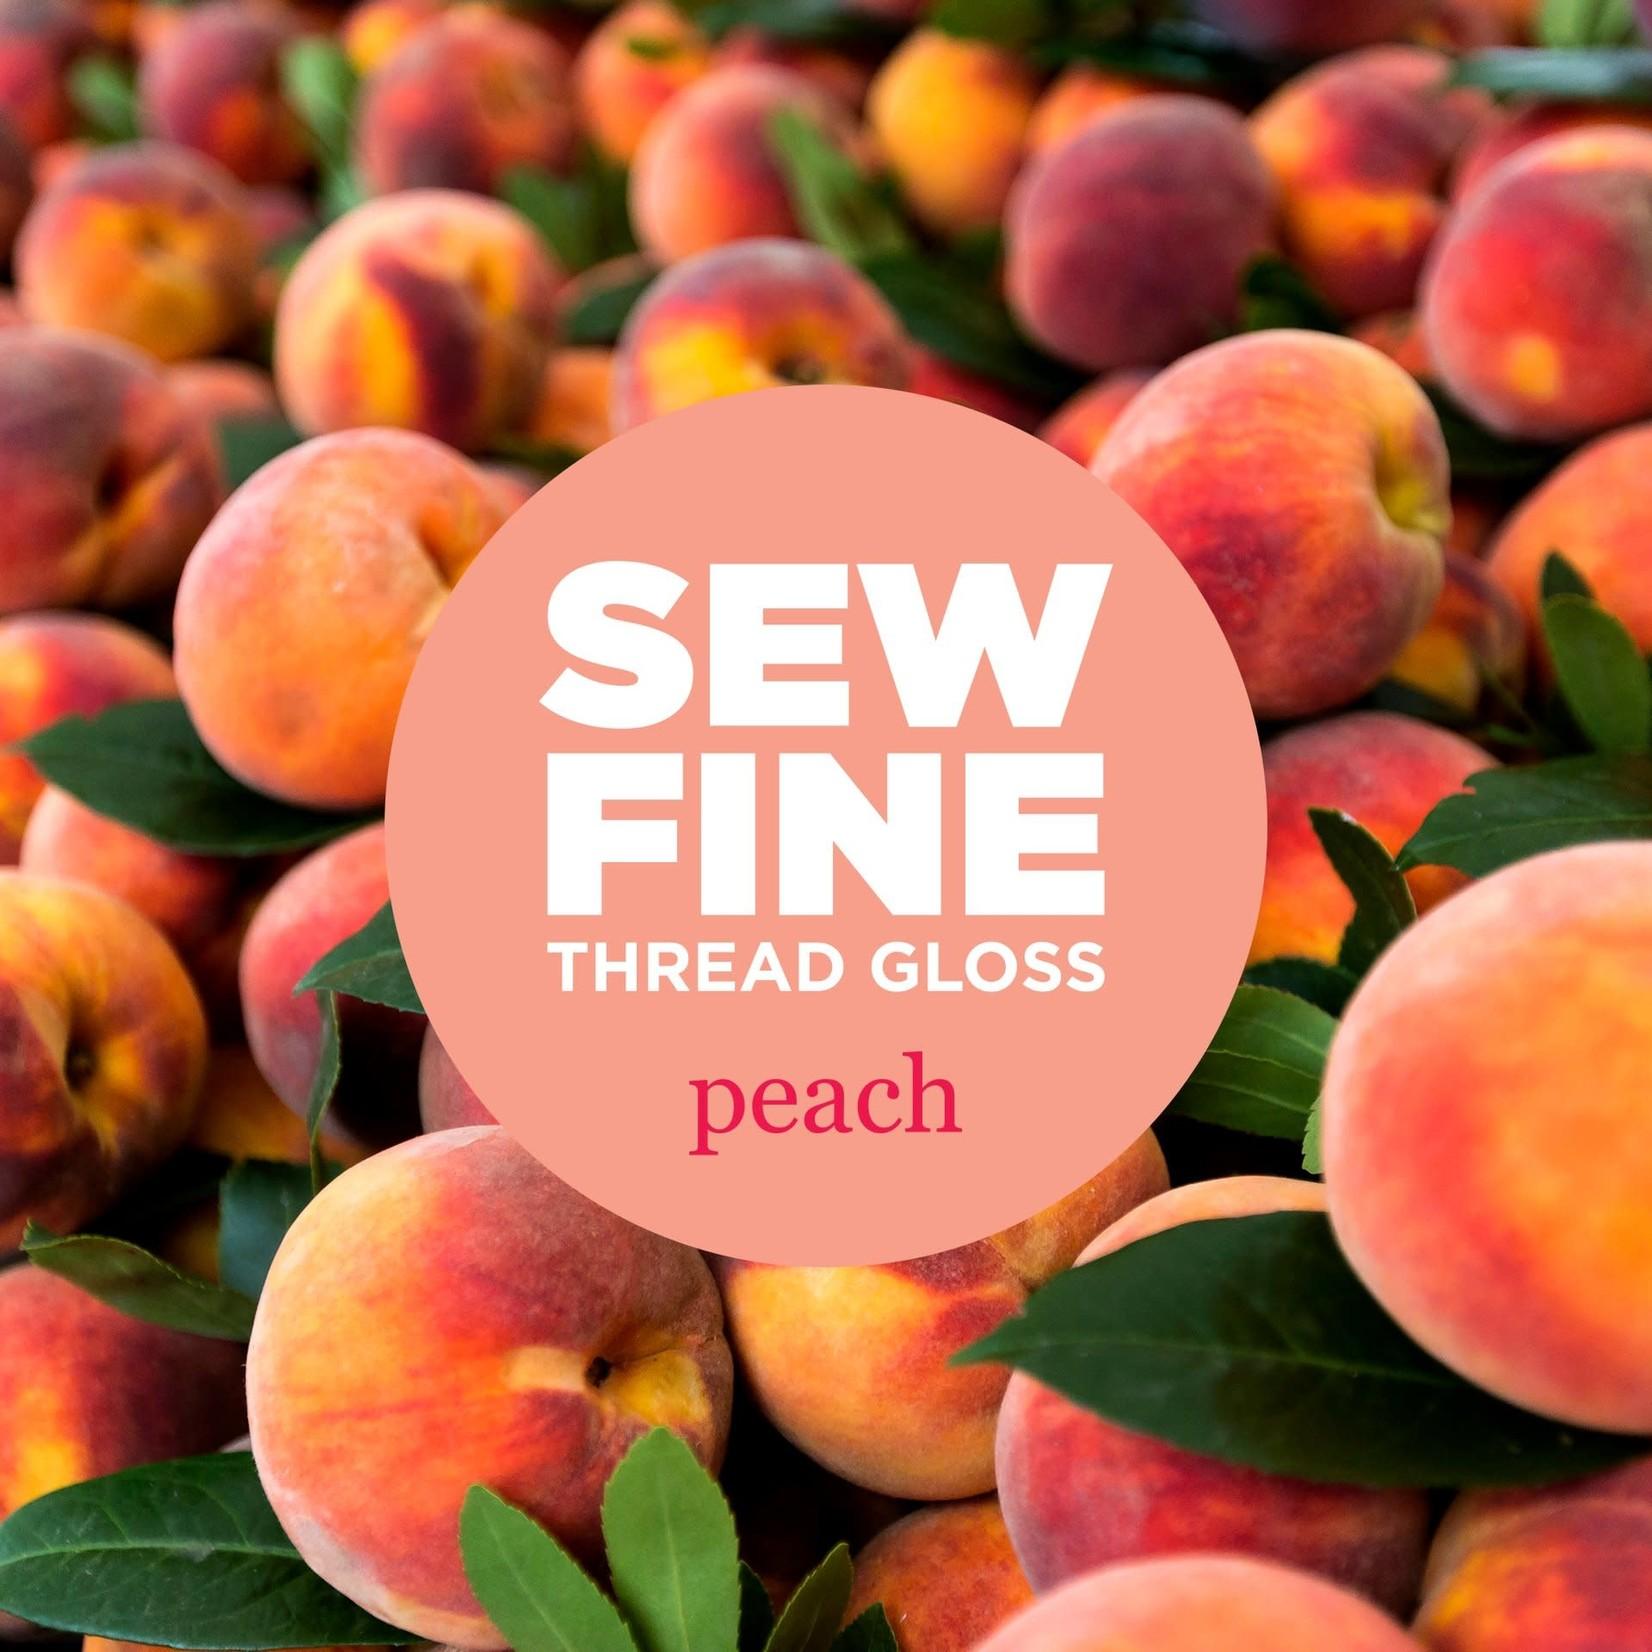 Sew Fine Sew Fine Thread Gloss: Peach 0.5 oz